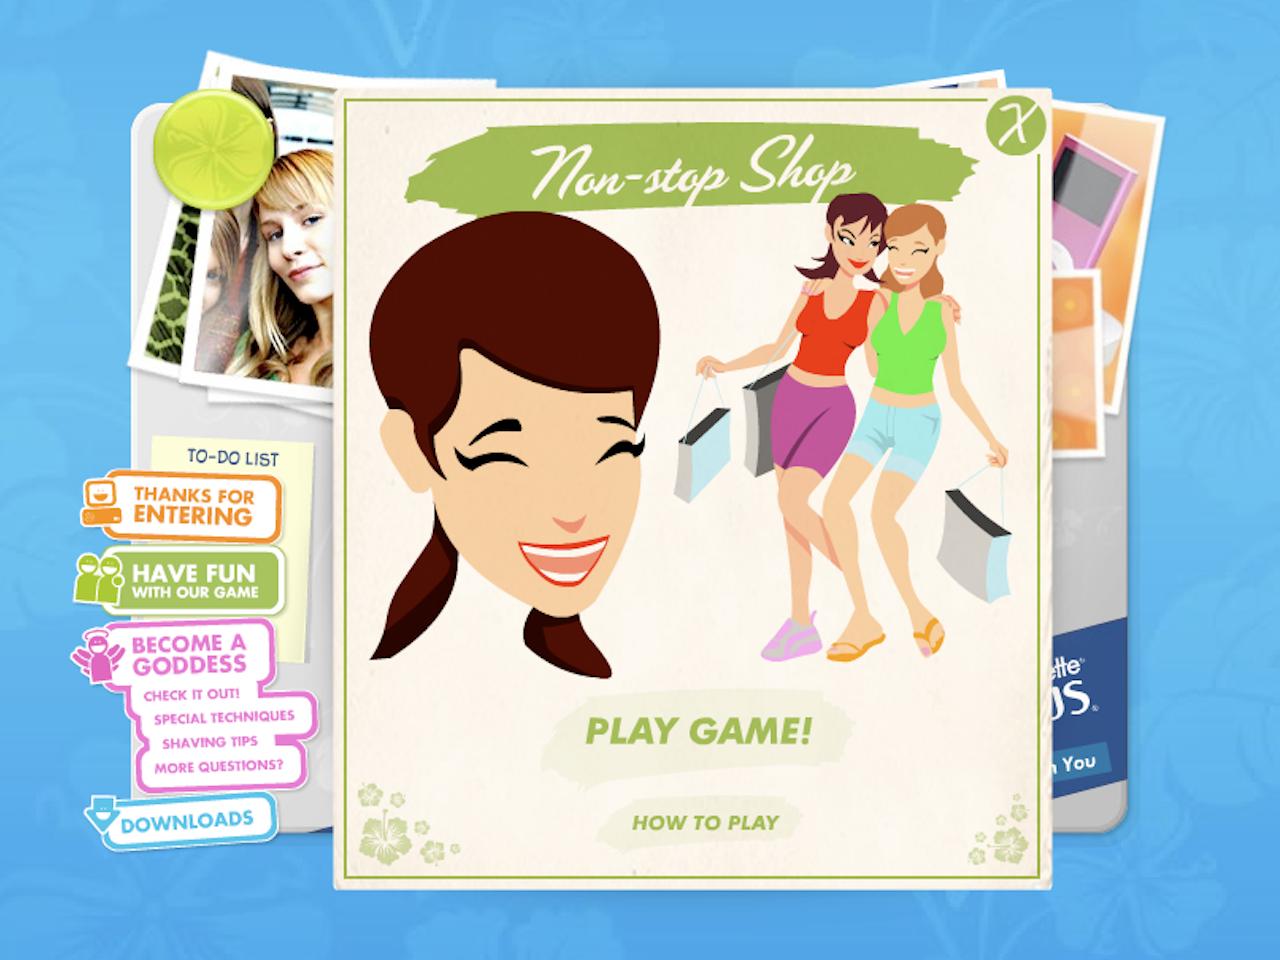 girls shopping friends mobile website internet online game gaming